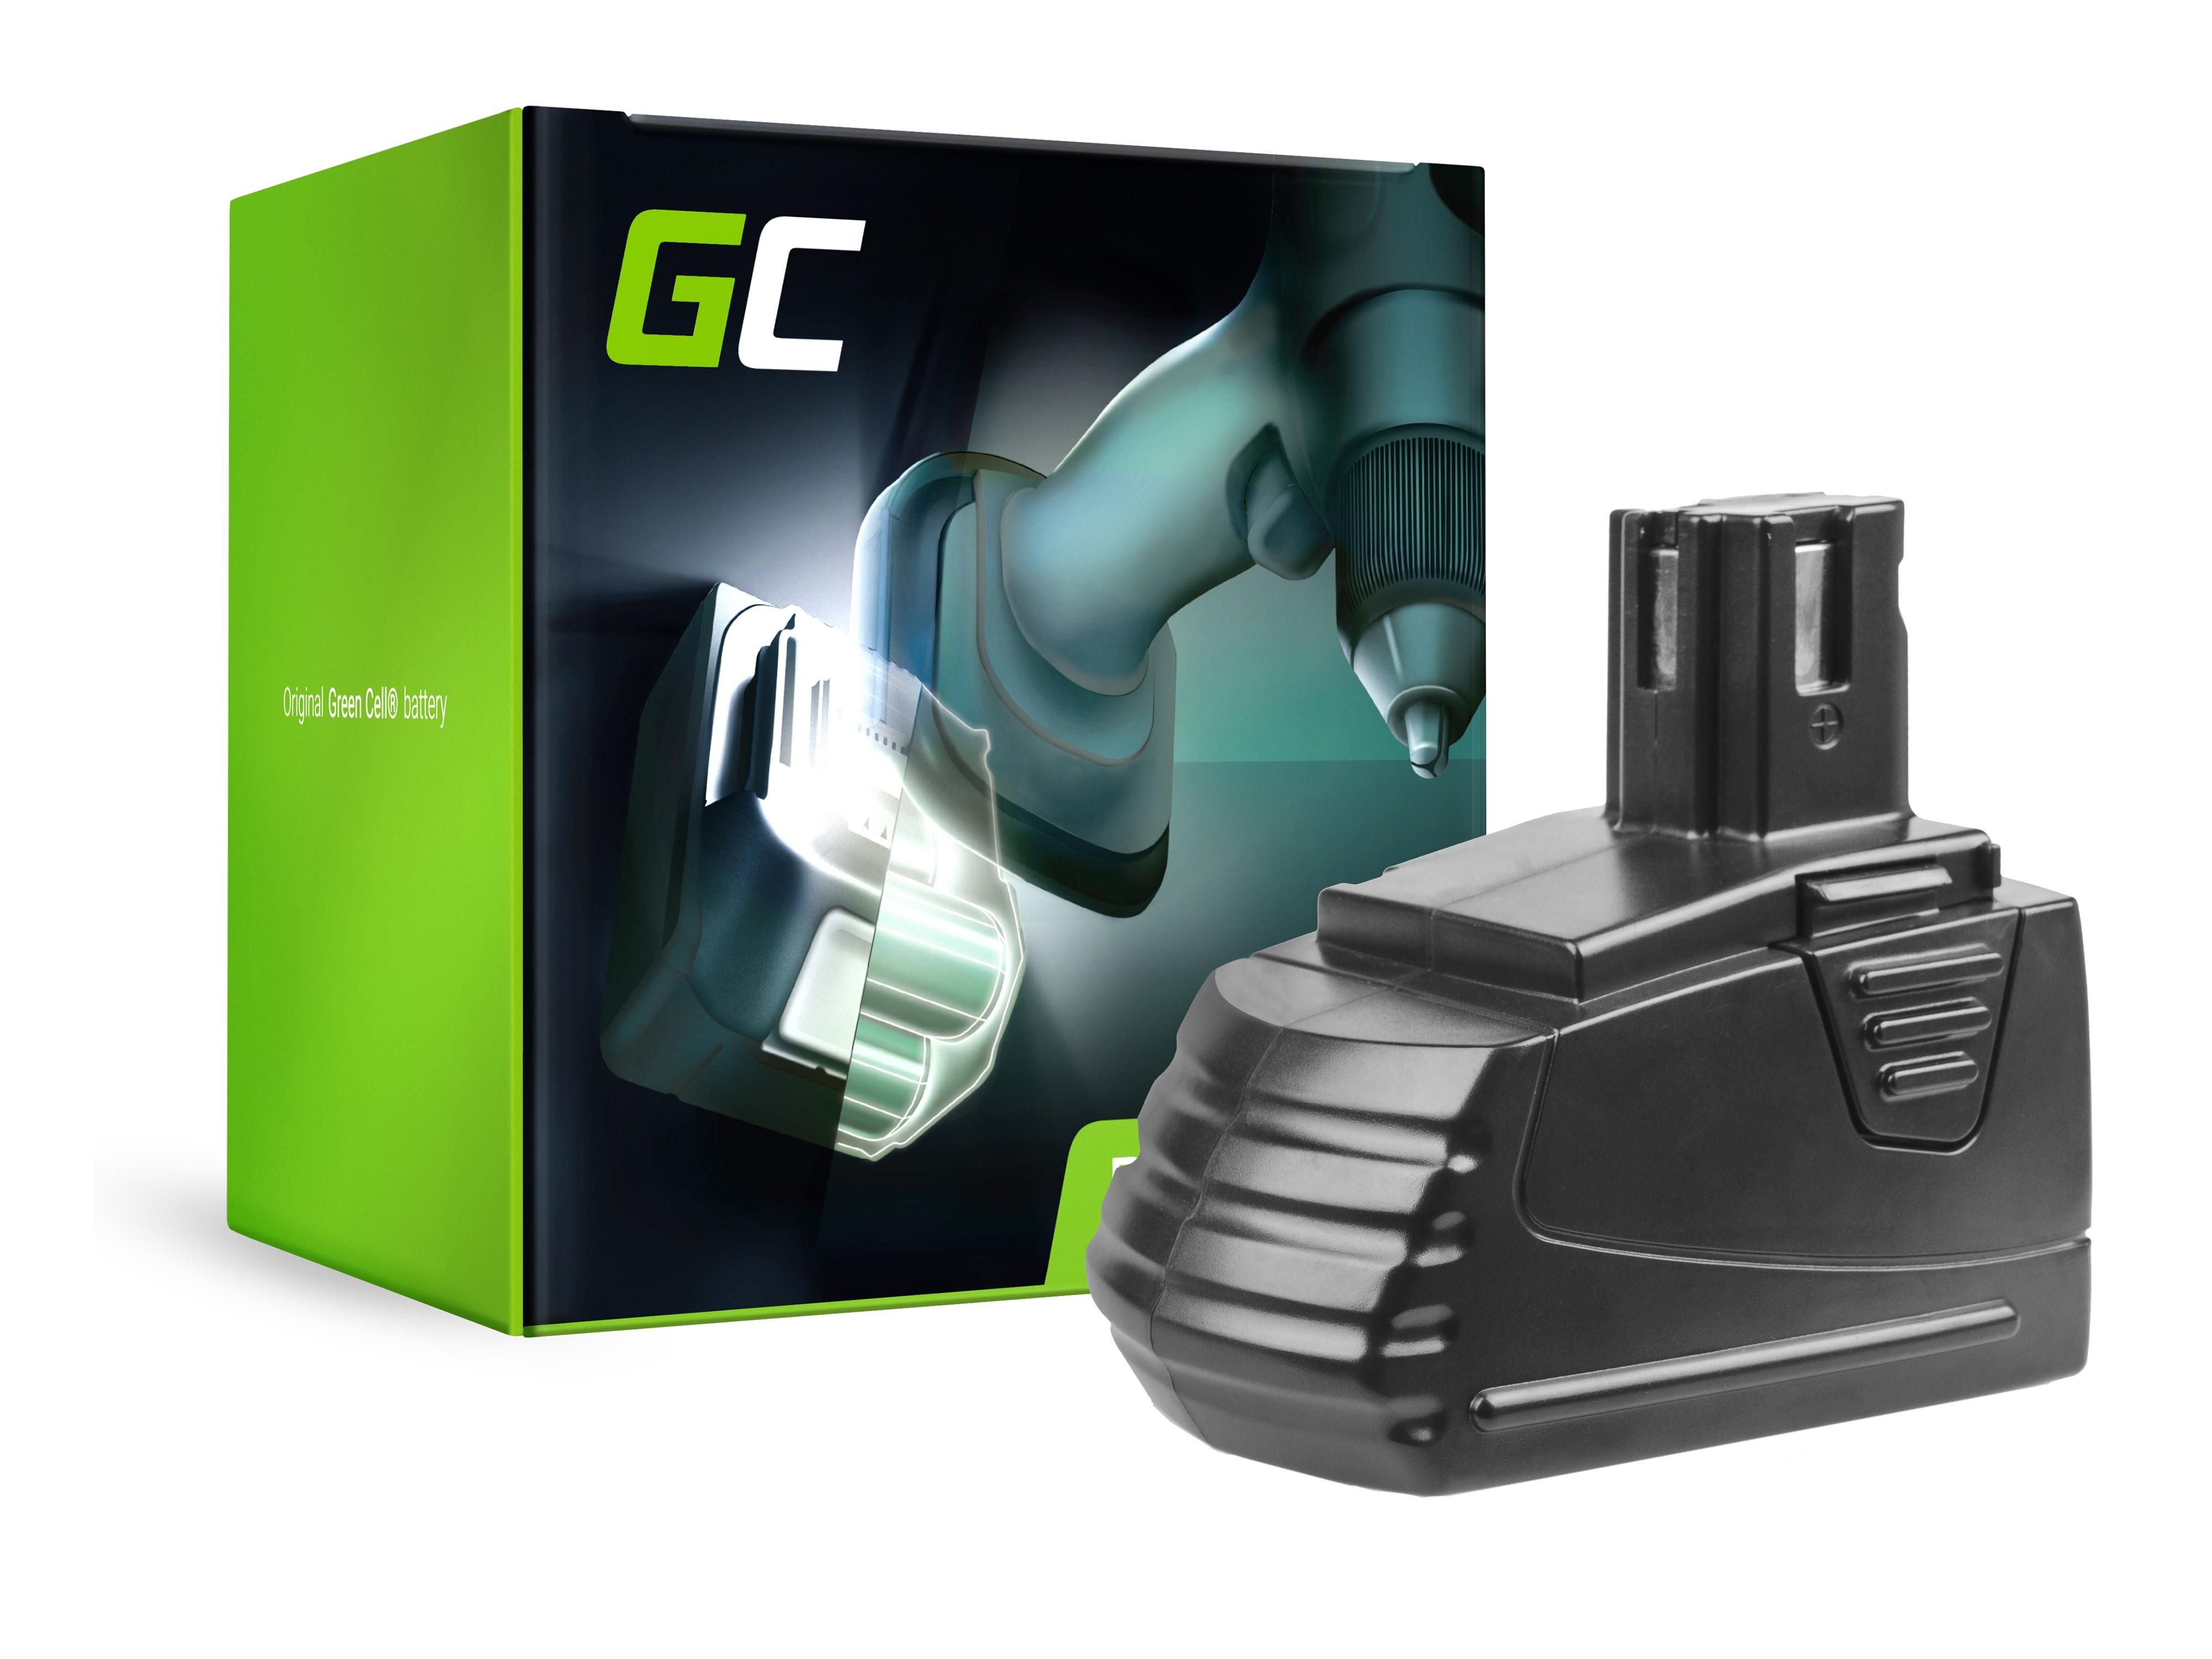 Green Cellverktygsbatteri SFB 121 SFB 126 Green Cell för Hilti SF 121-A SFL 12/15 SID 121-A